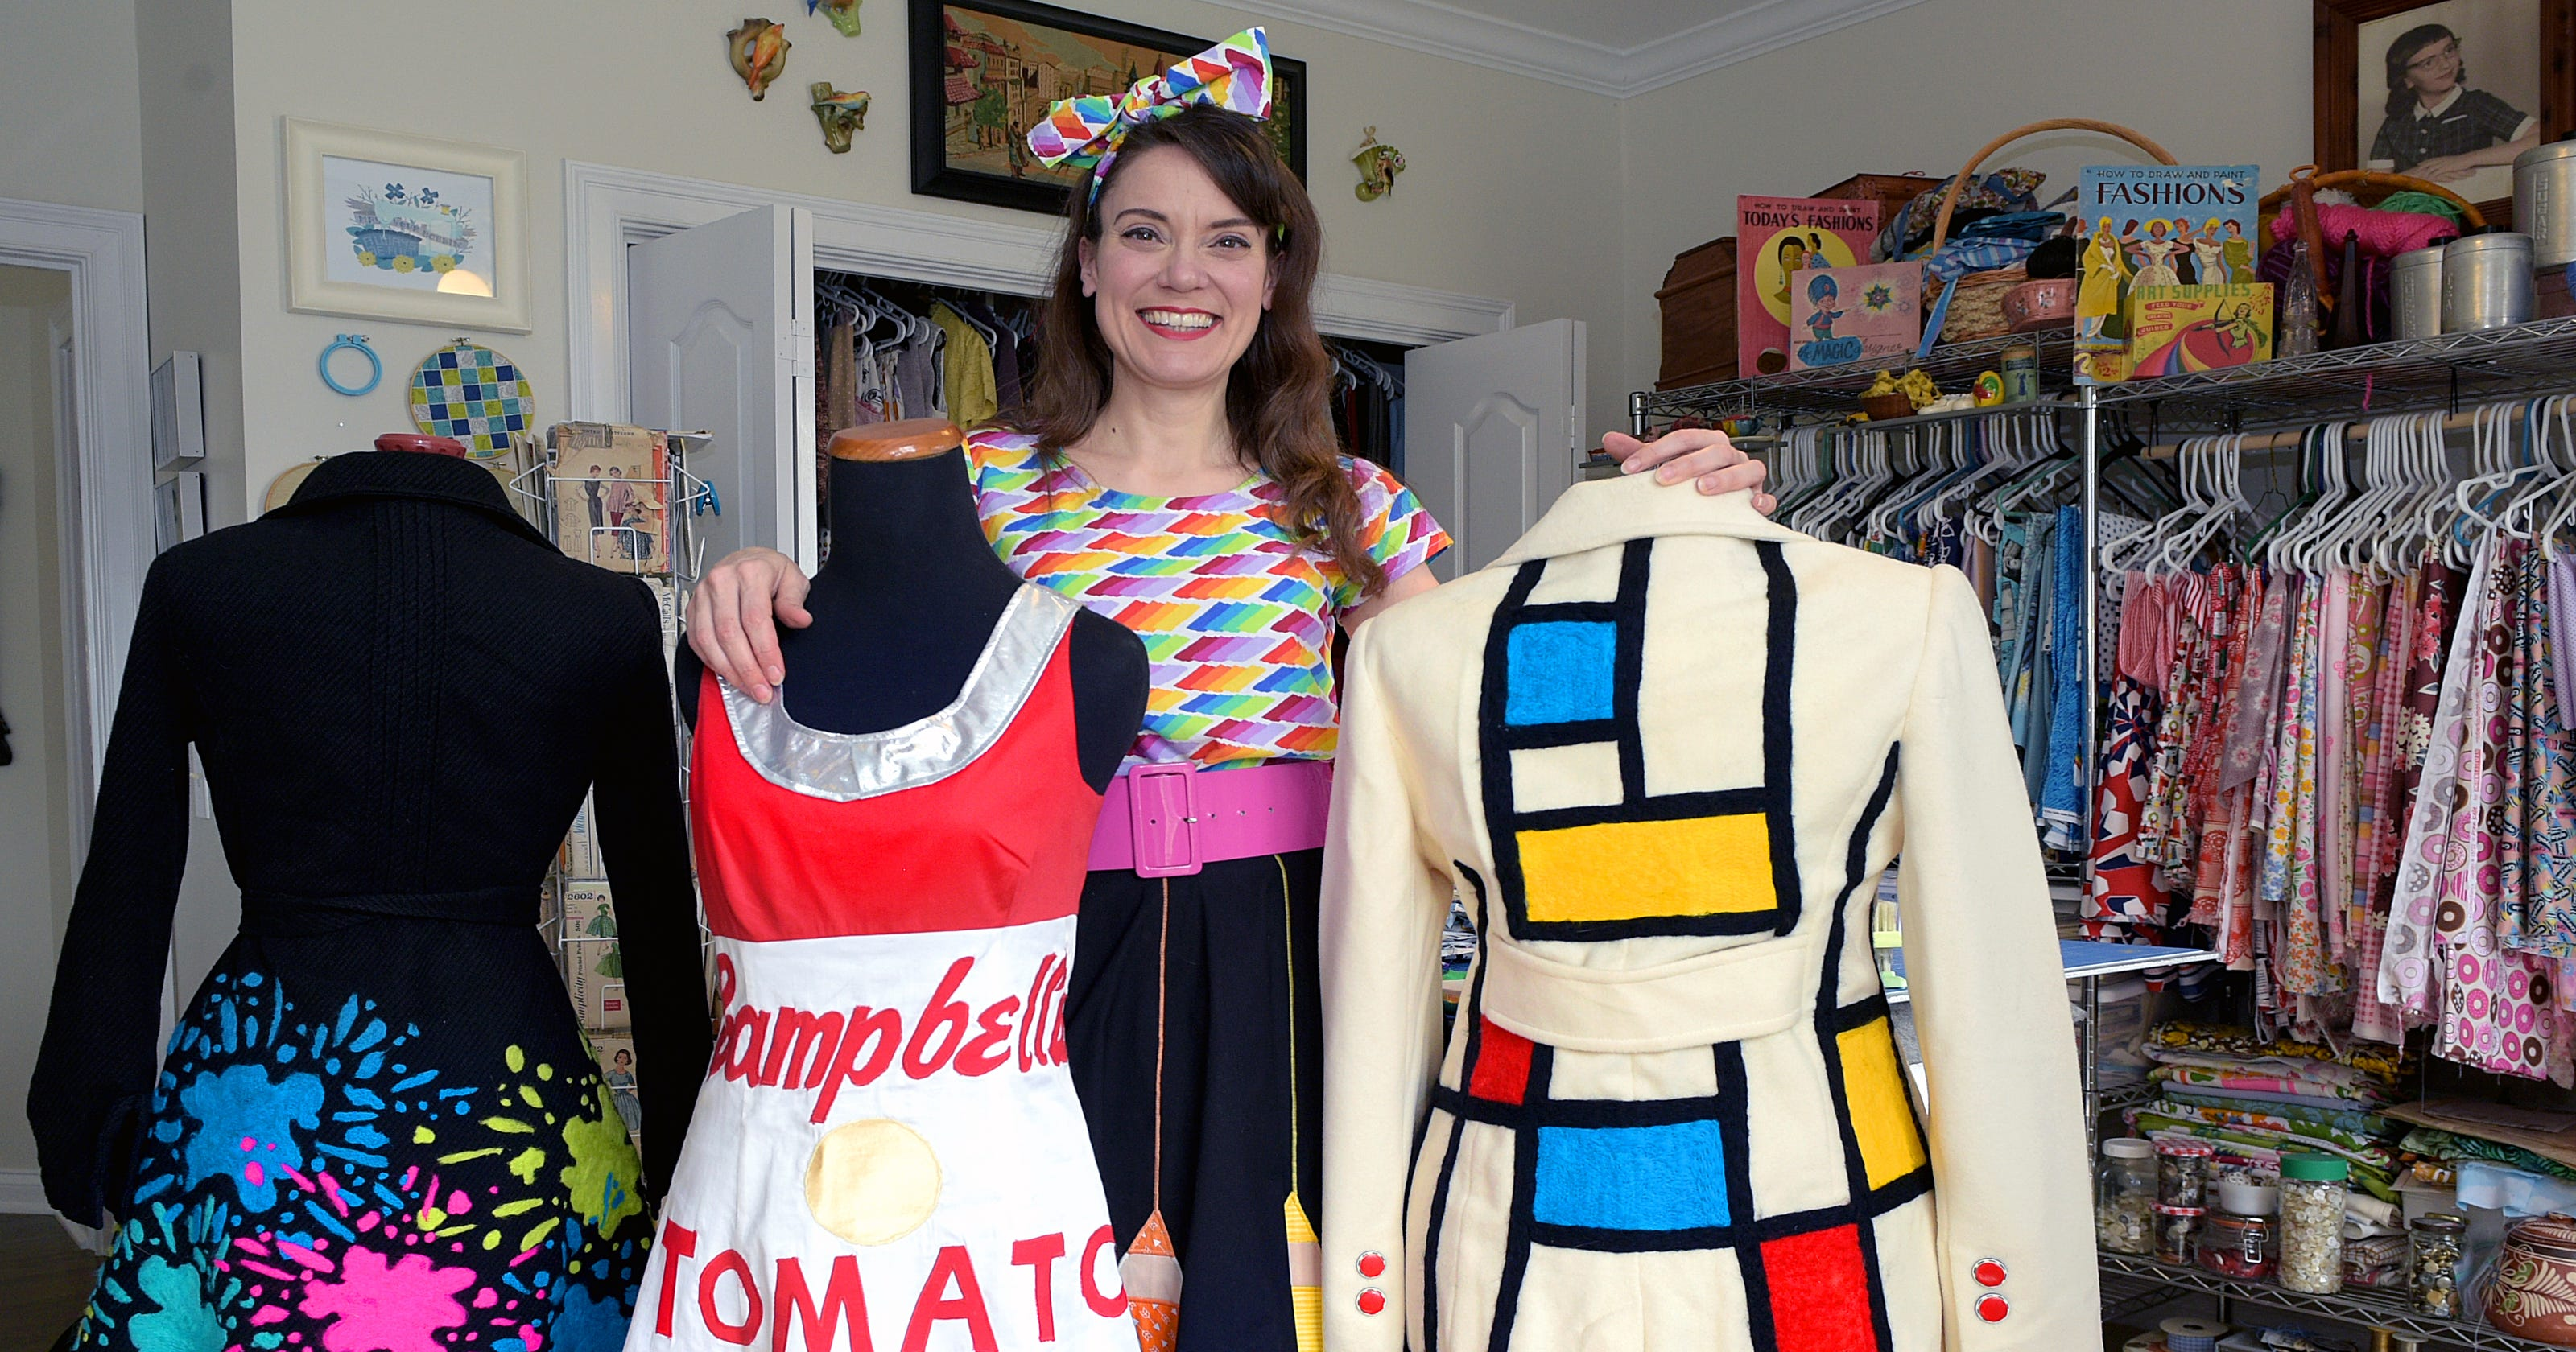 franklin art teacher s funky style inspires students